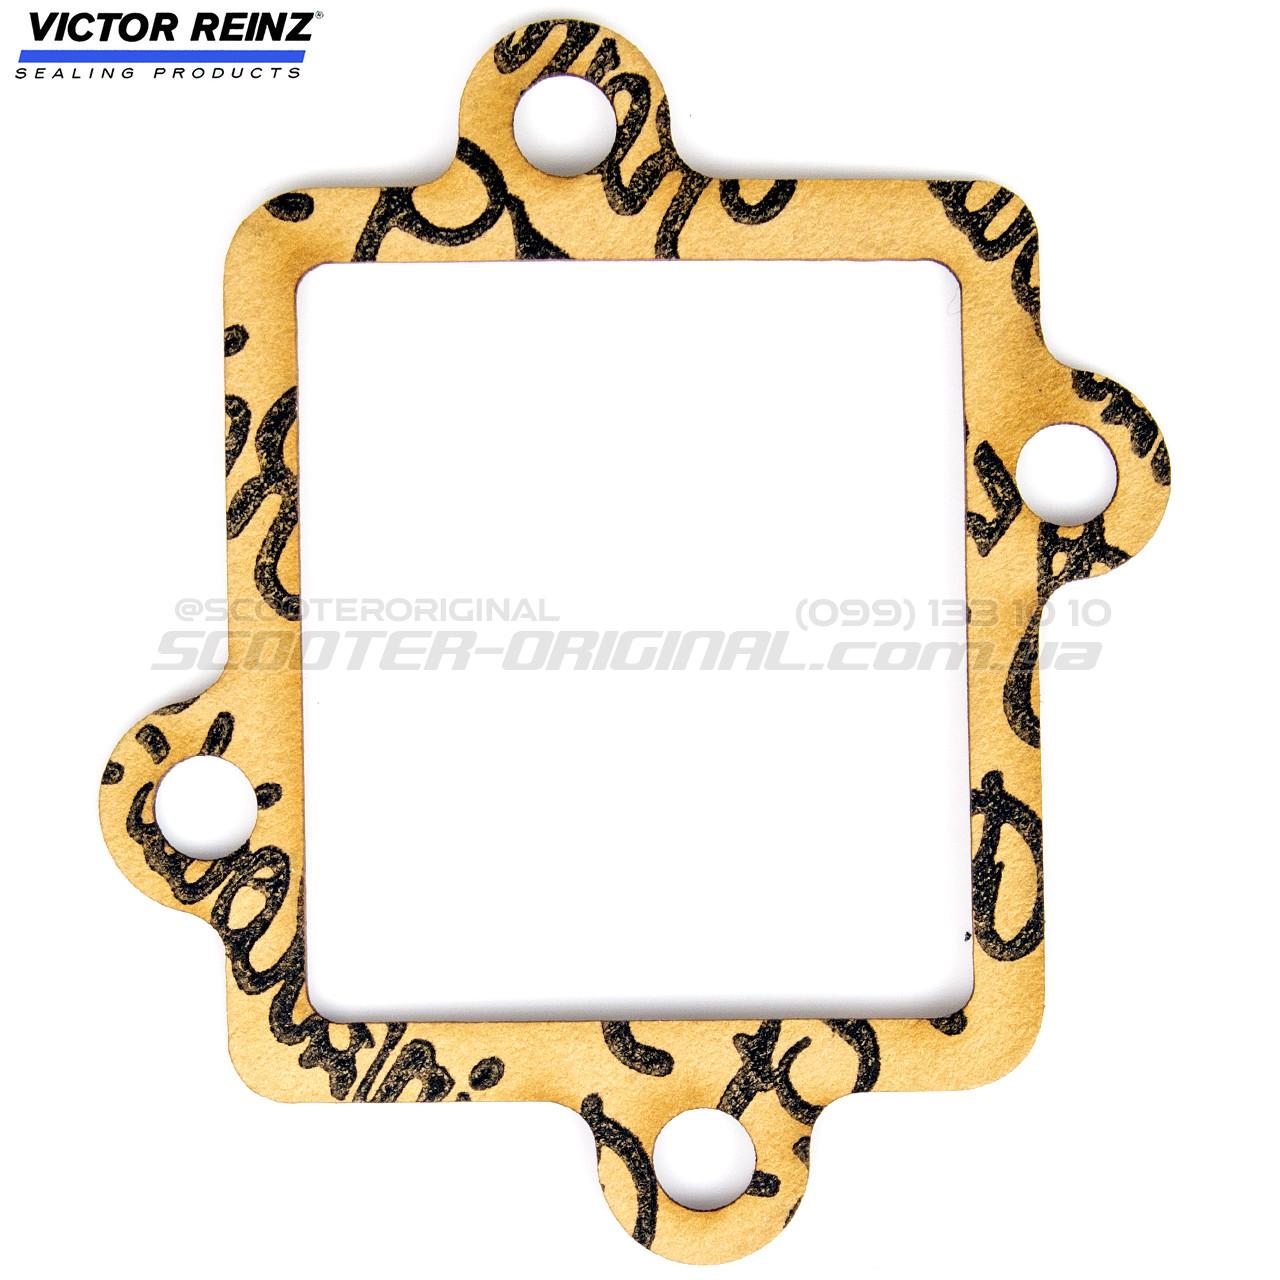 Прокладка пелюсткового клапана VICTOR REINZ Minarelli Horizontal (Yamaha 3KJ)